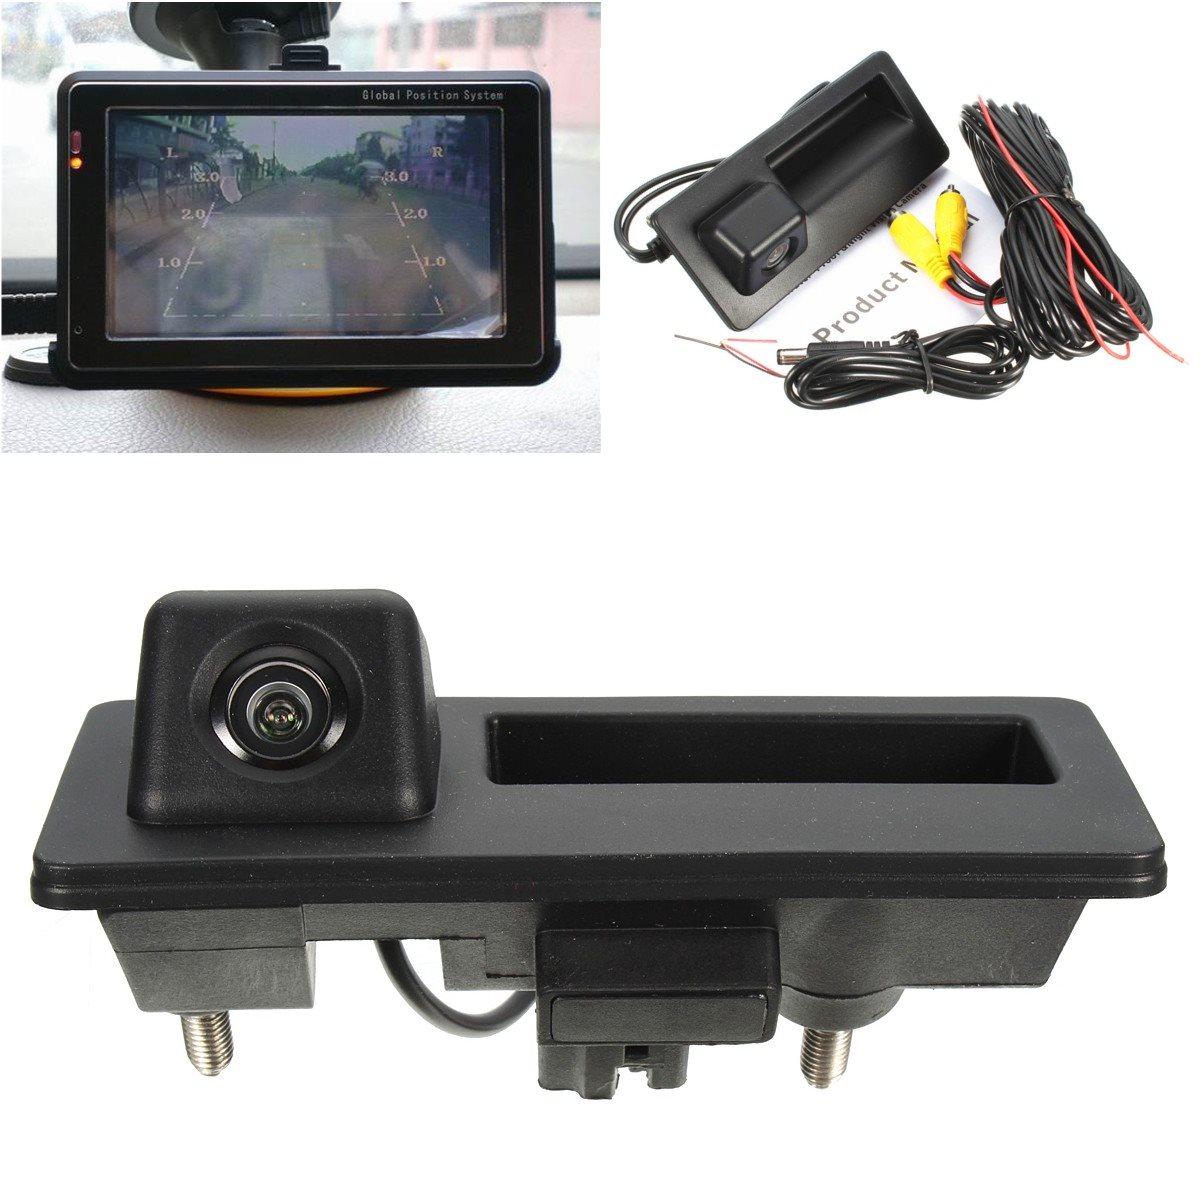 Car Rear View Cameras Reversing Reverse Camera For VW GOLF JETTA TIGUAN RCD510 RNS315 RNS310 RNS510